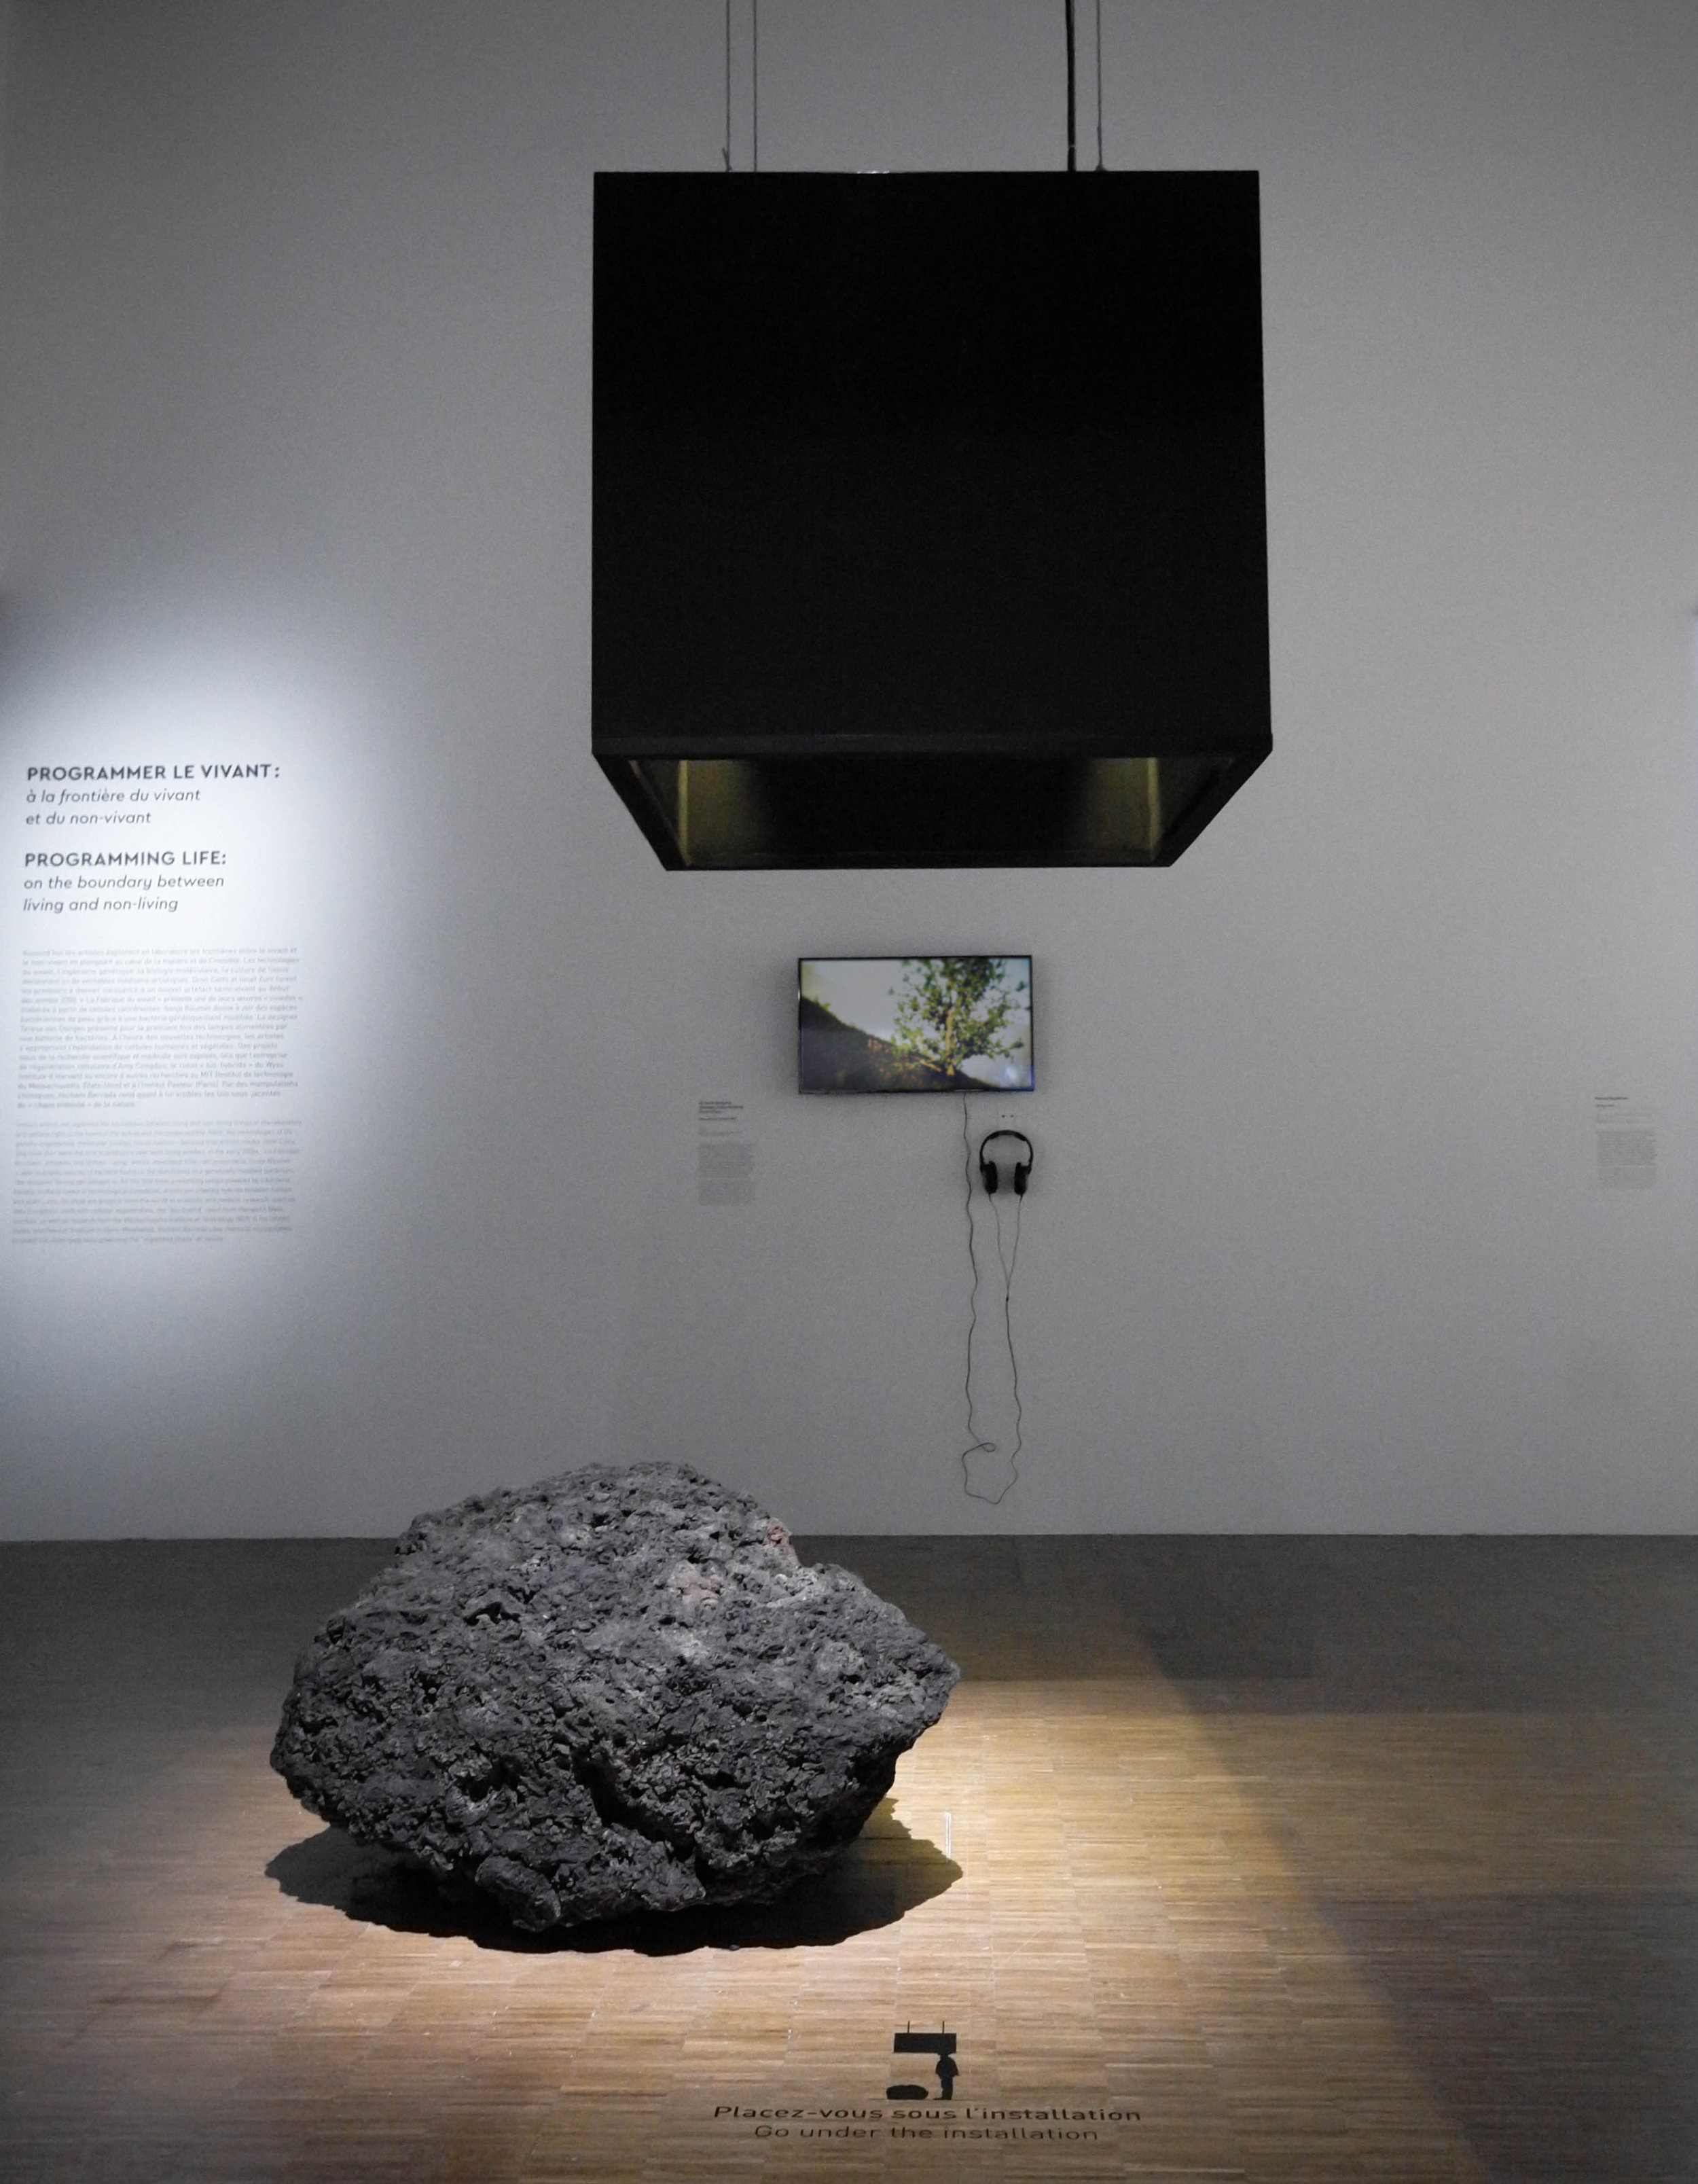 Installation at La Fabrique du Vivant, Centre Pompidou.  Resurrecting the Sublime: Hibiscadelphus wilderianus  Rock (smell diffusion hood, lava boulder, documentary film), February 2019.